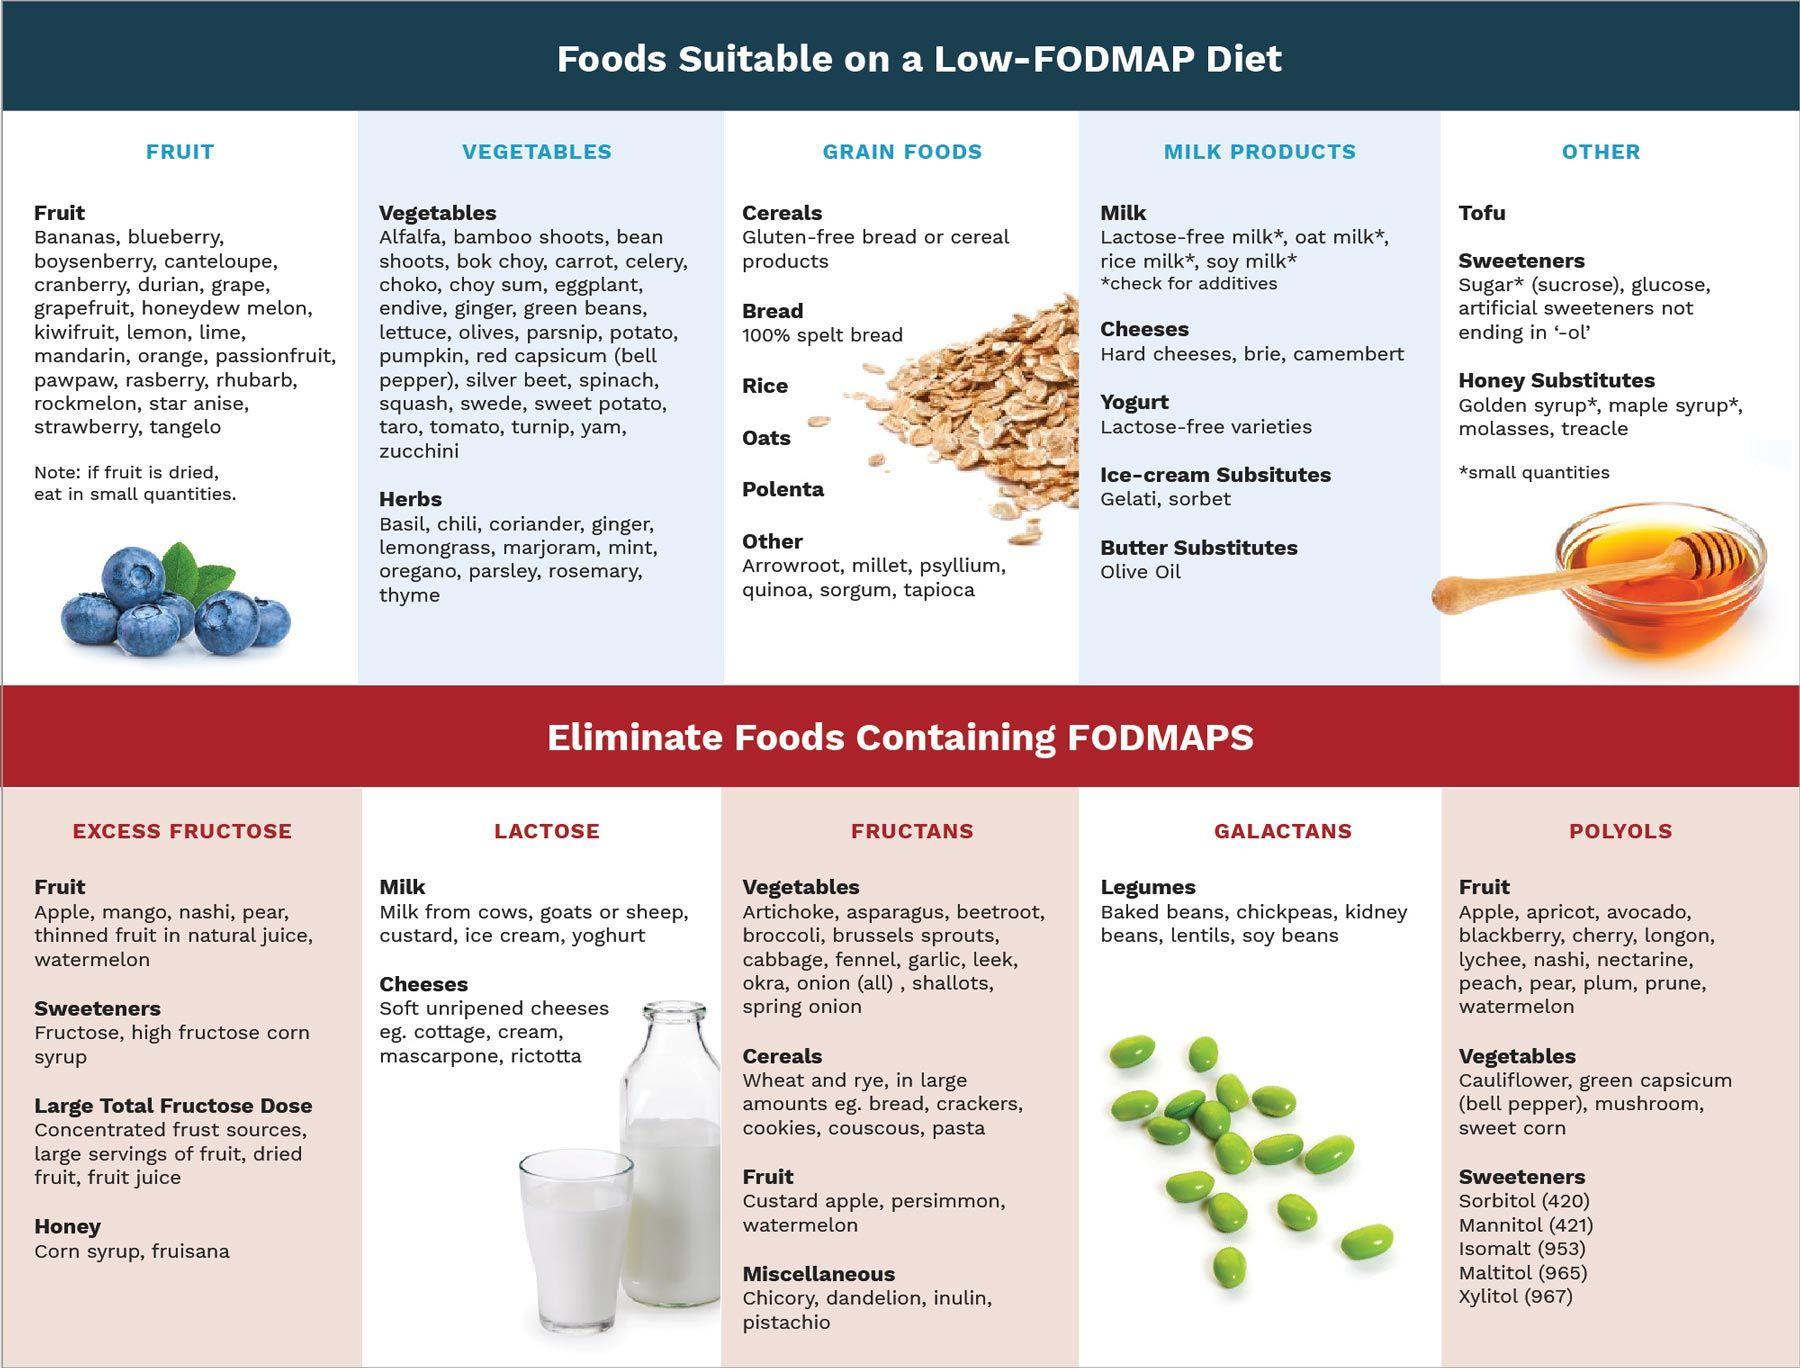 Foods suitable for a fodmap diet chart. | Fodmap diet ...